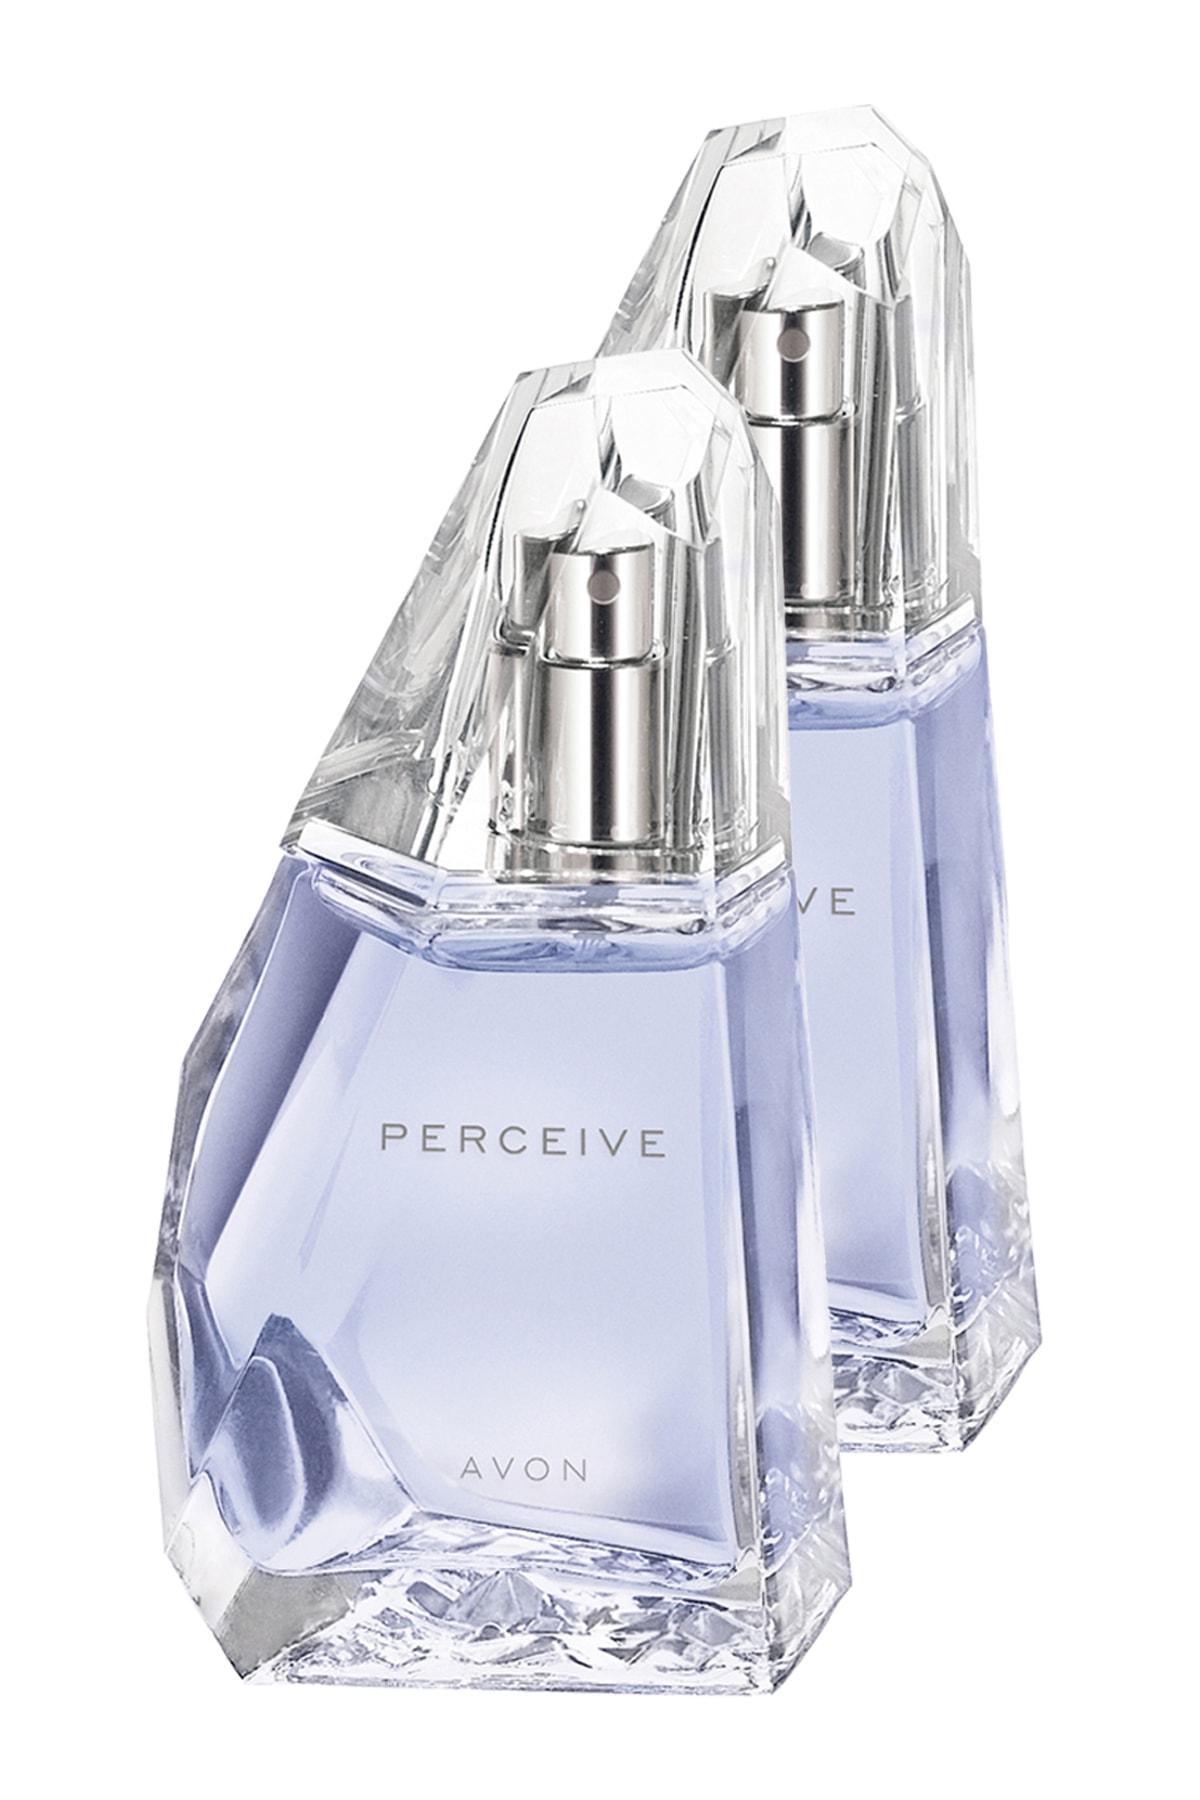 AVON Perceive Kadın Parfüm Edp 50 ml 2'li Set 5050000101851